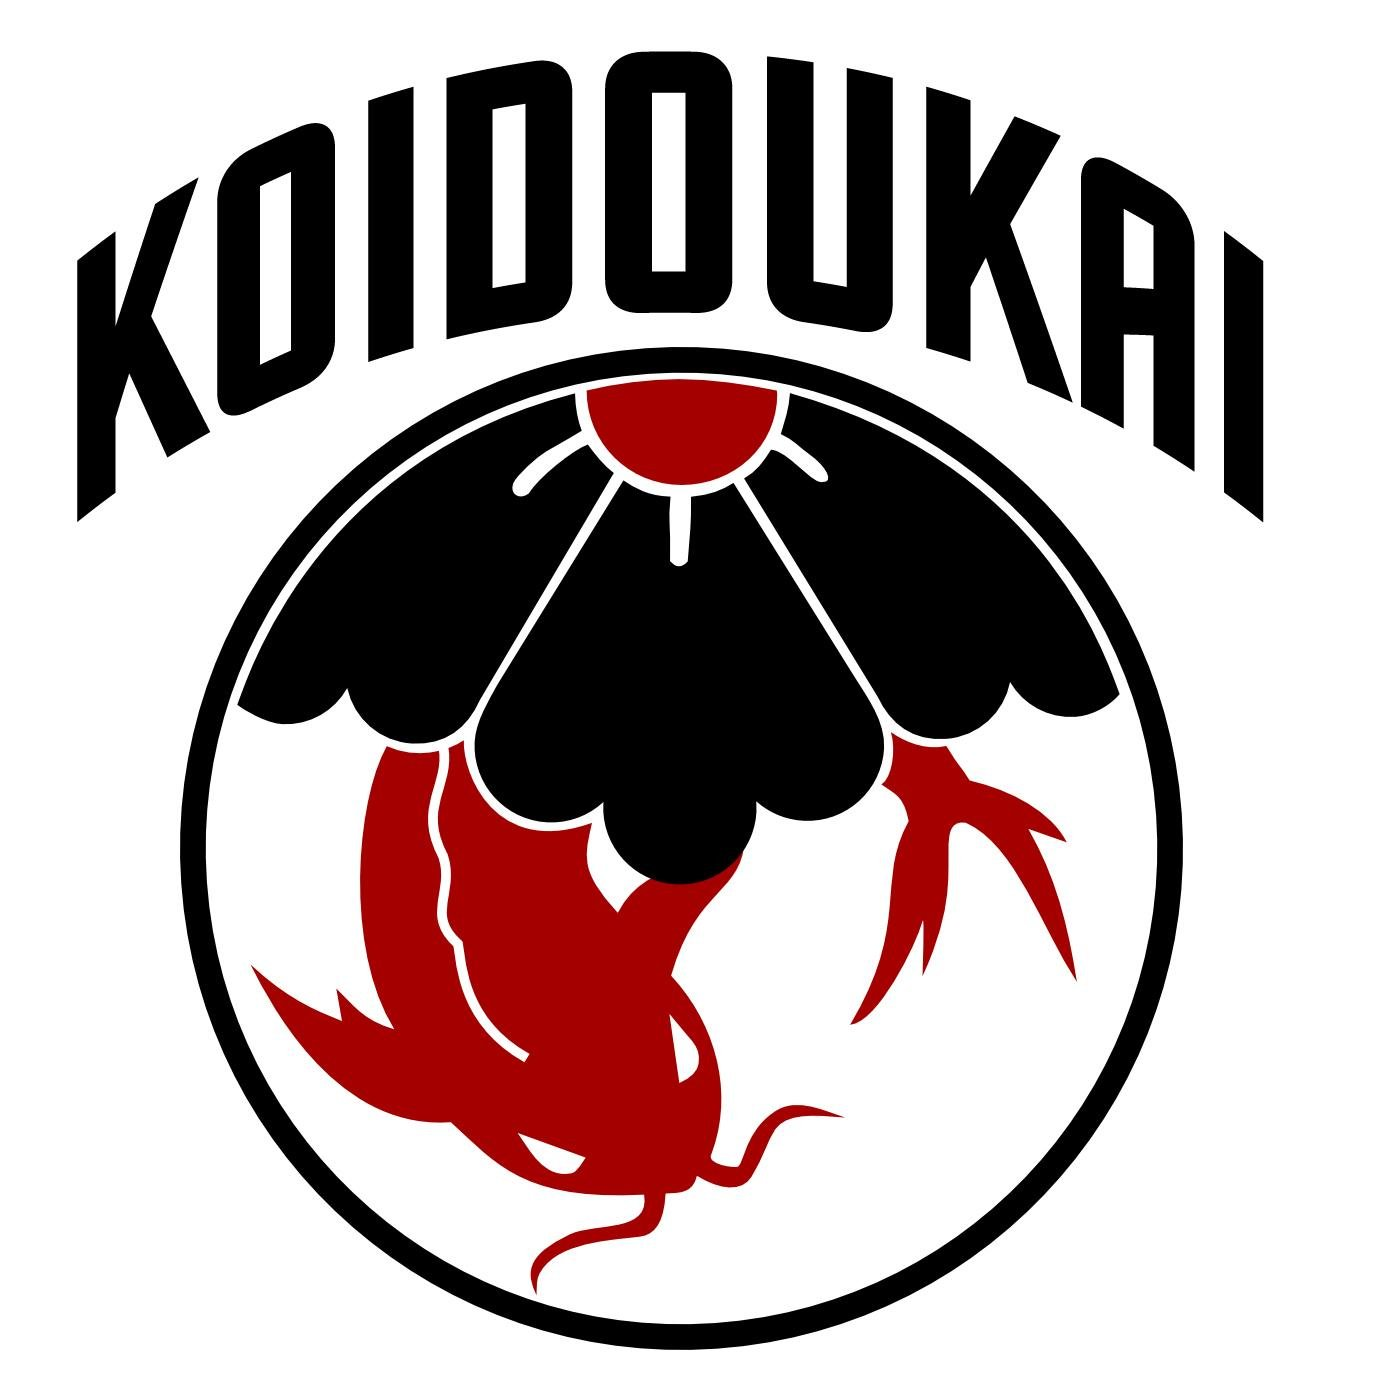 Koidoukai Yosakoi (@koidoukai).